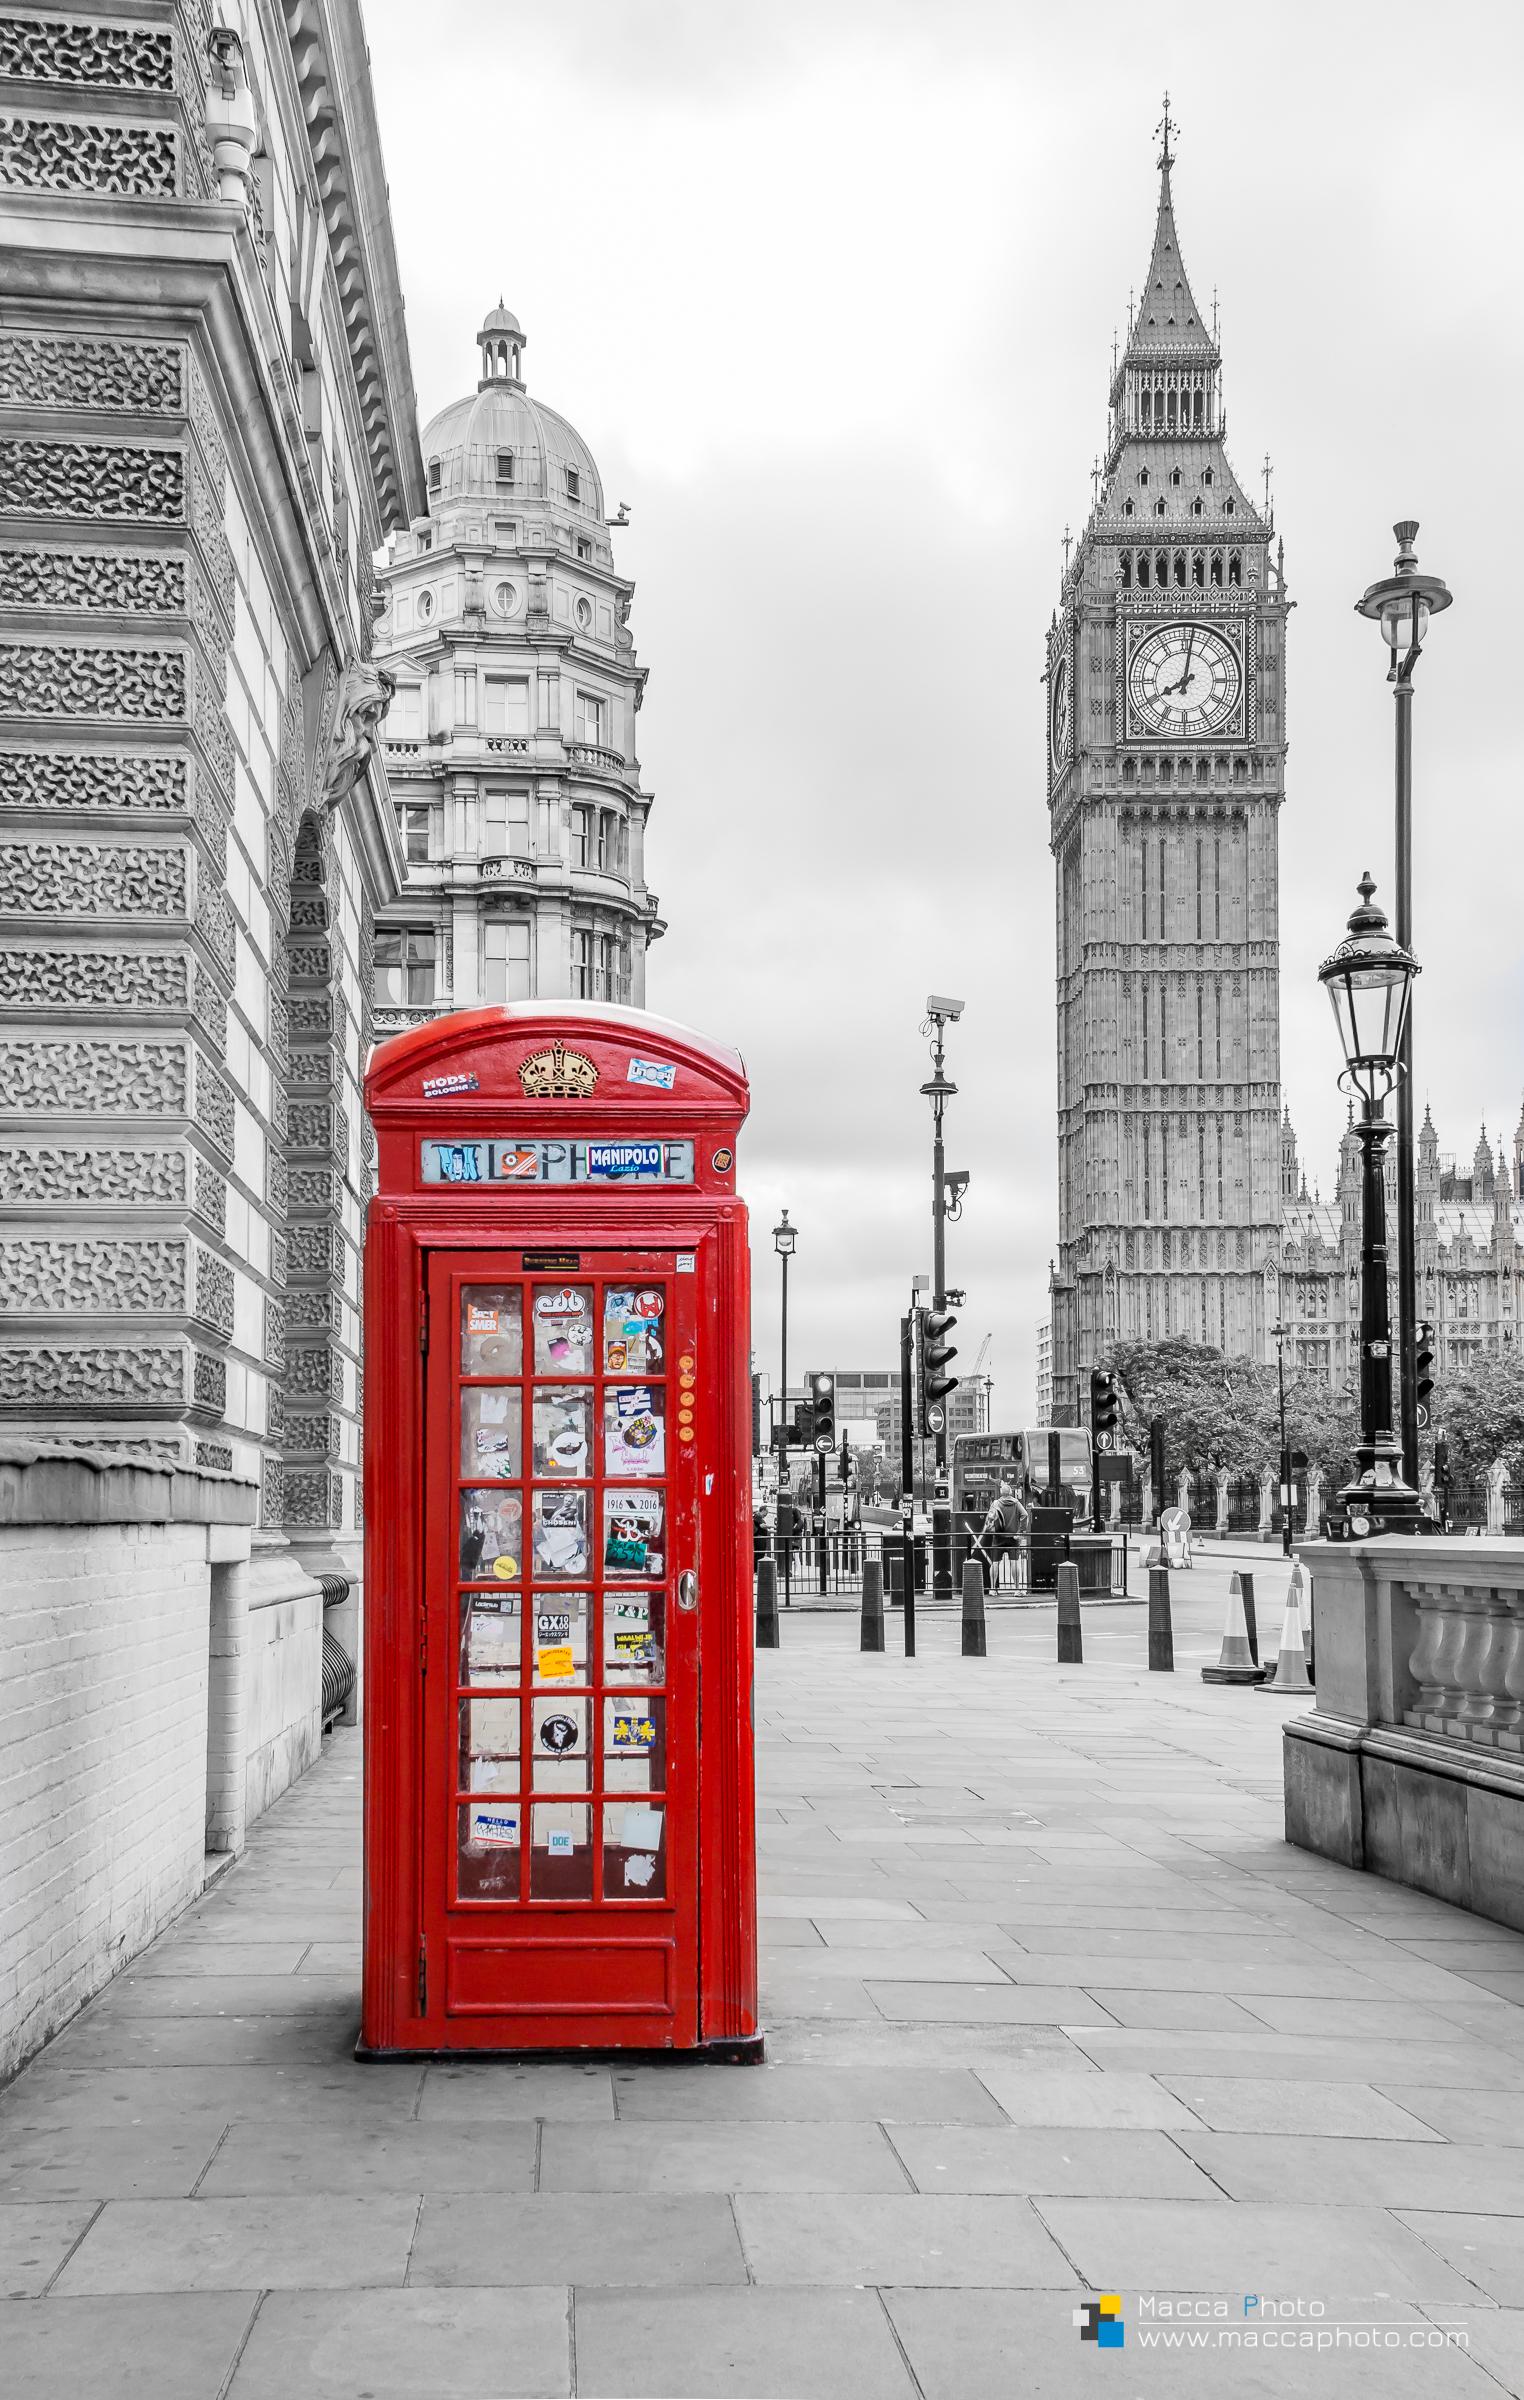 London - Telephone & Big Ben